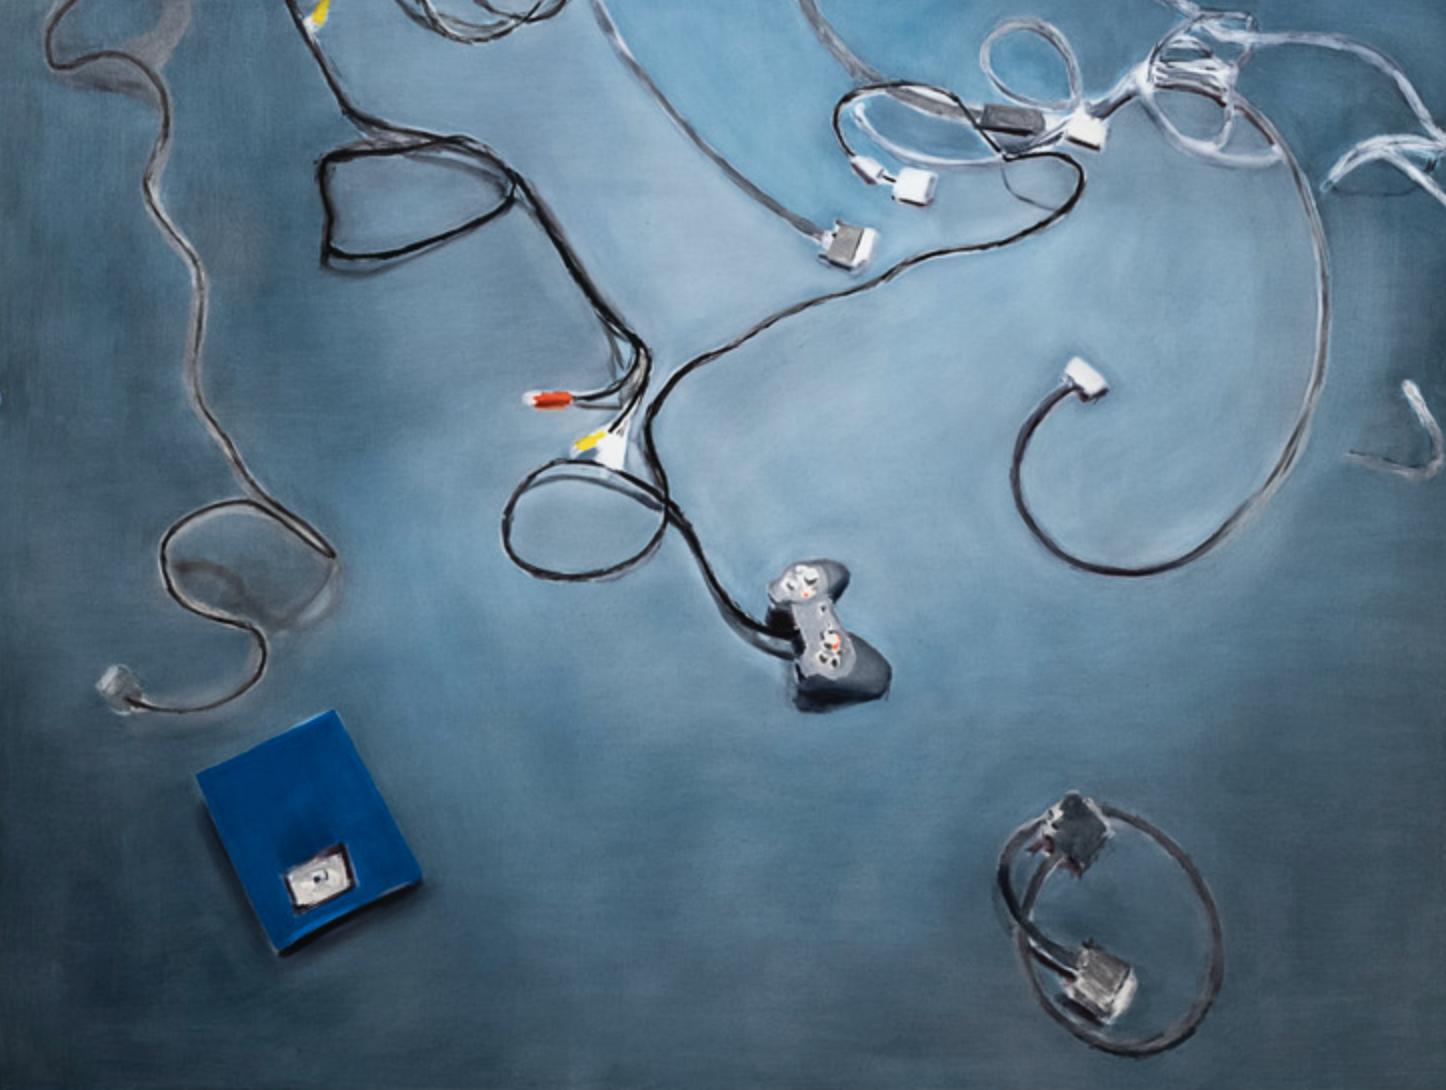 """My floor (zip drive"" 1997, olio su tela, 193 x 265 cm"